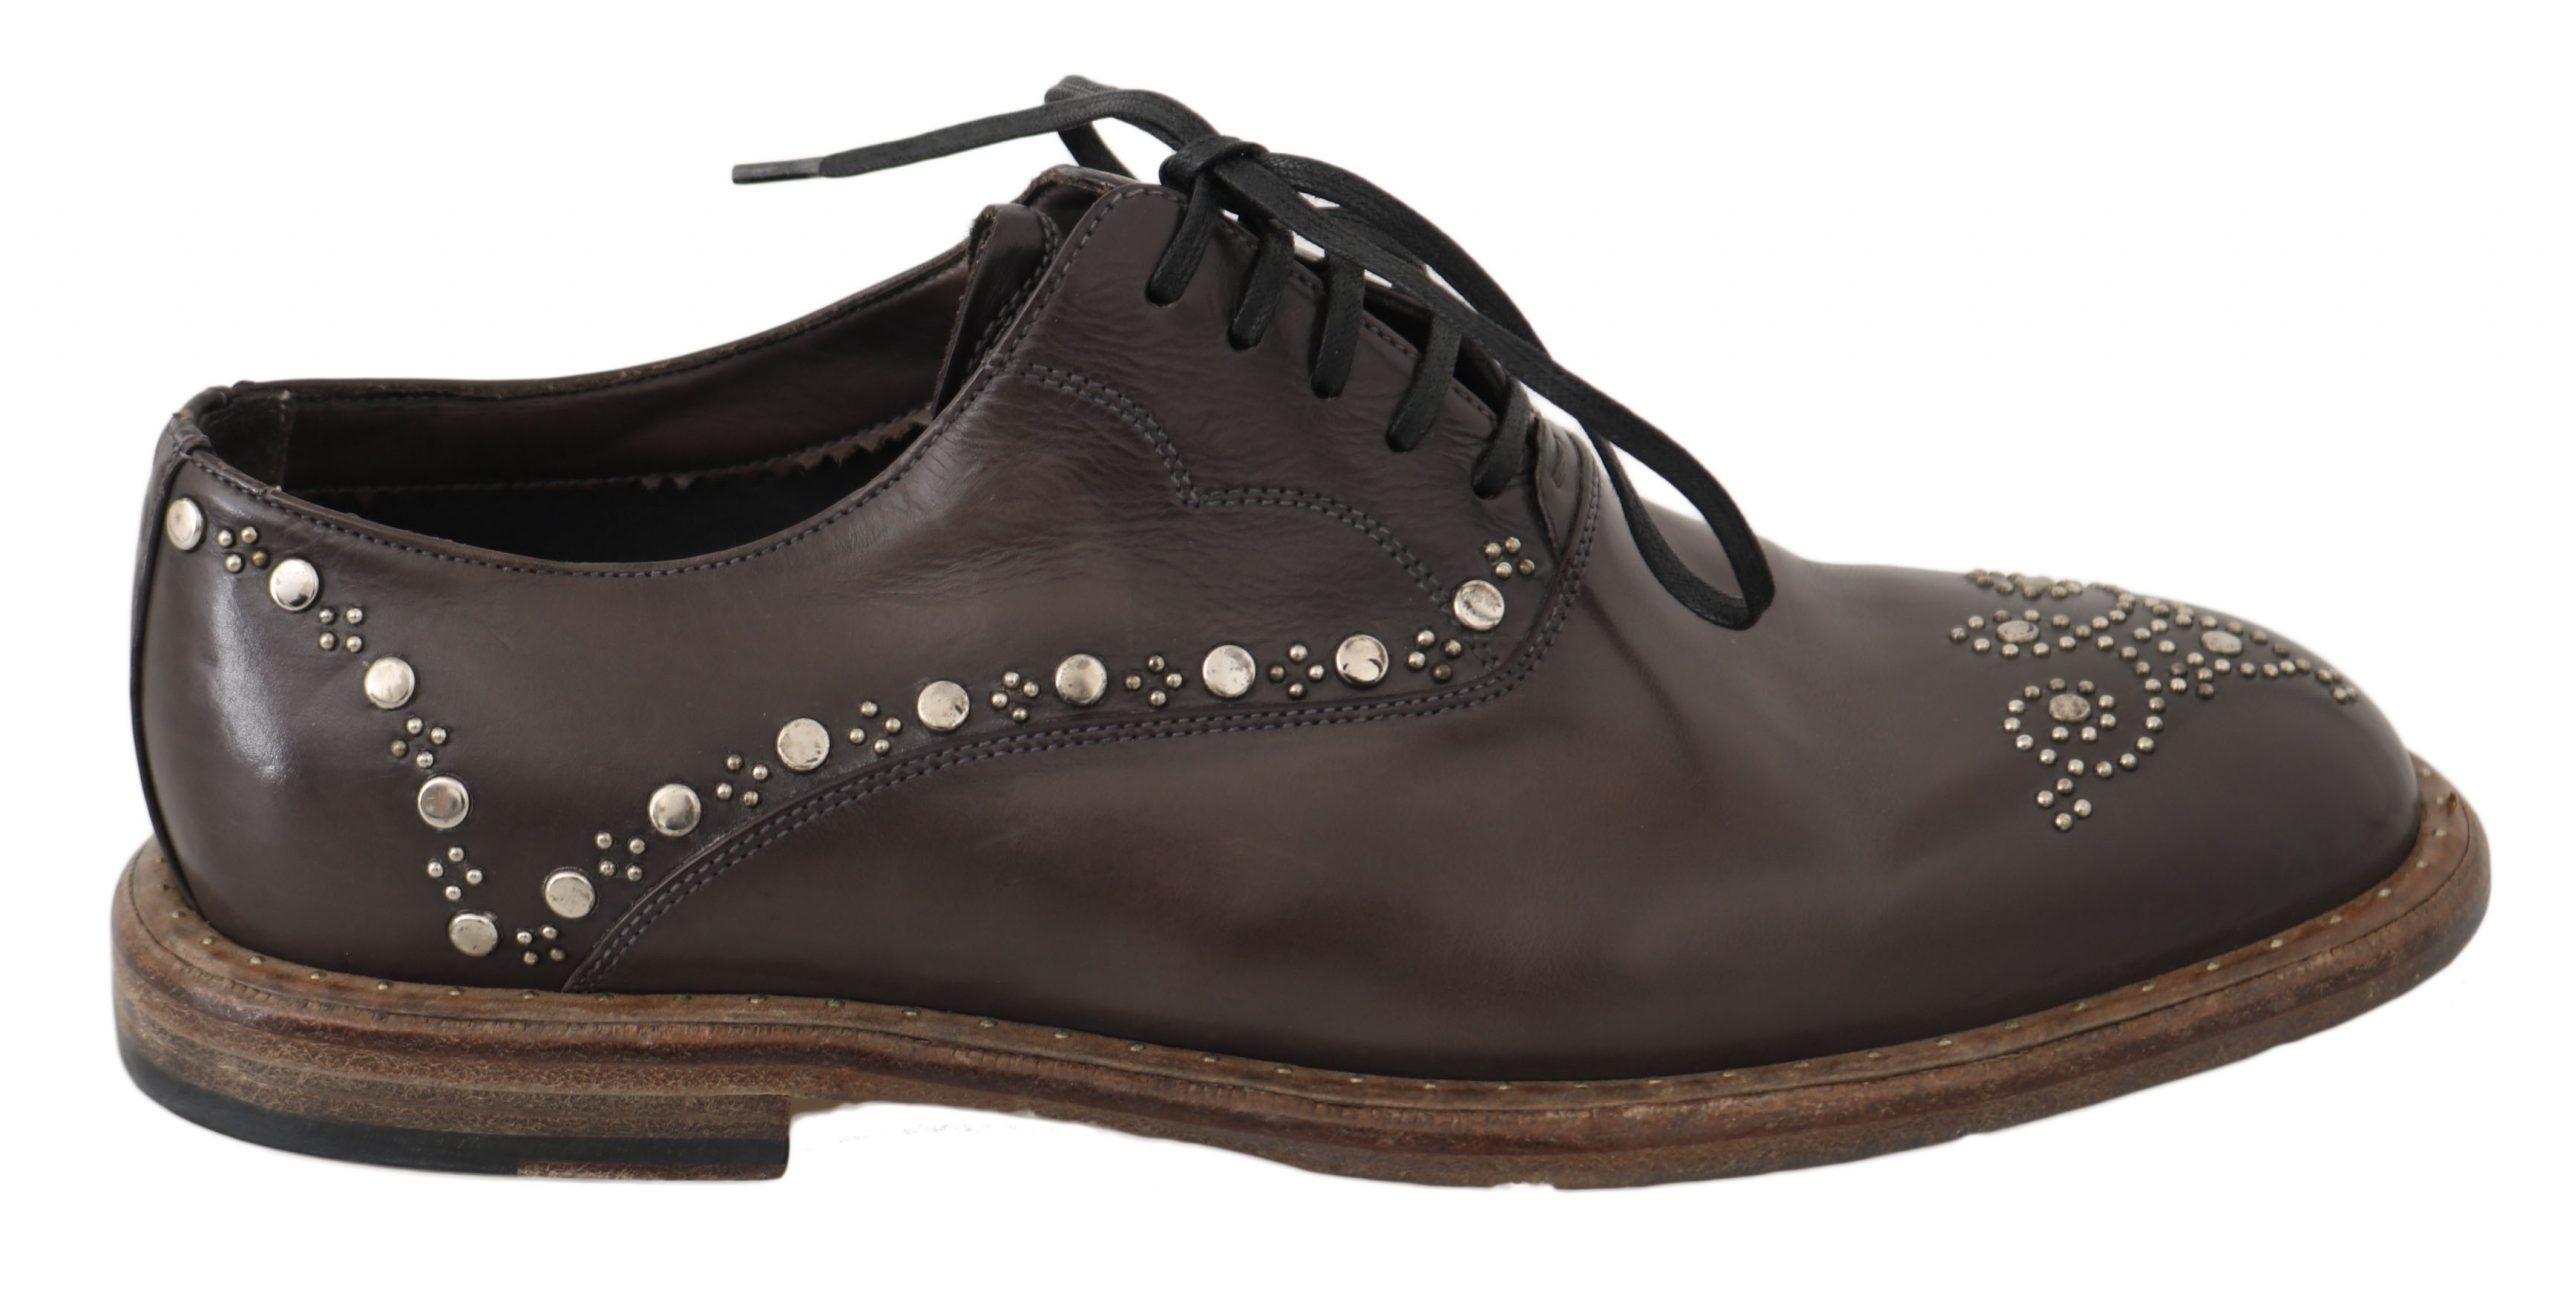 Dolce & Gabbana Men's Shoes Brown MV2332 - EU39/US6